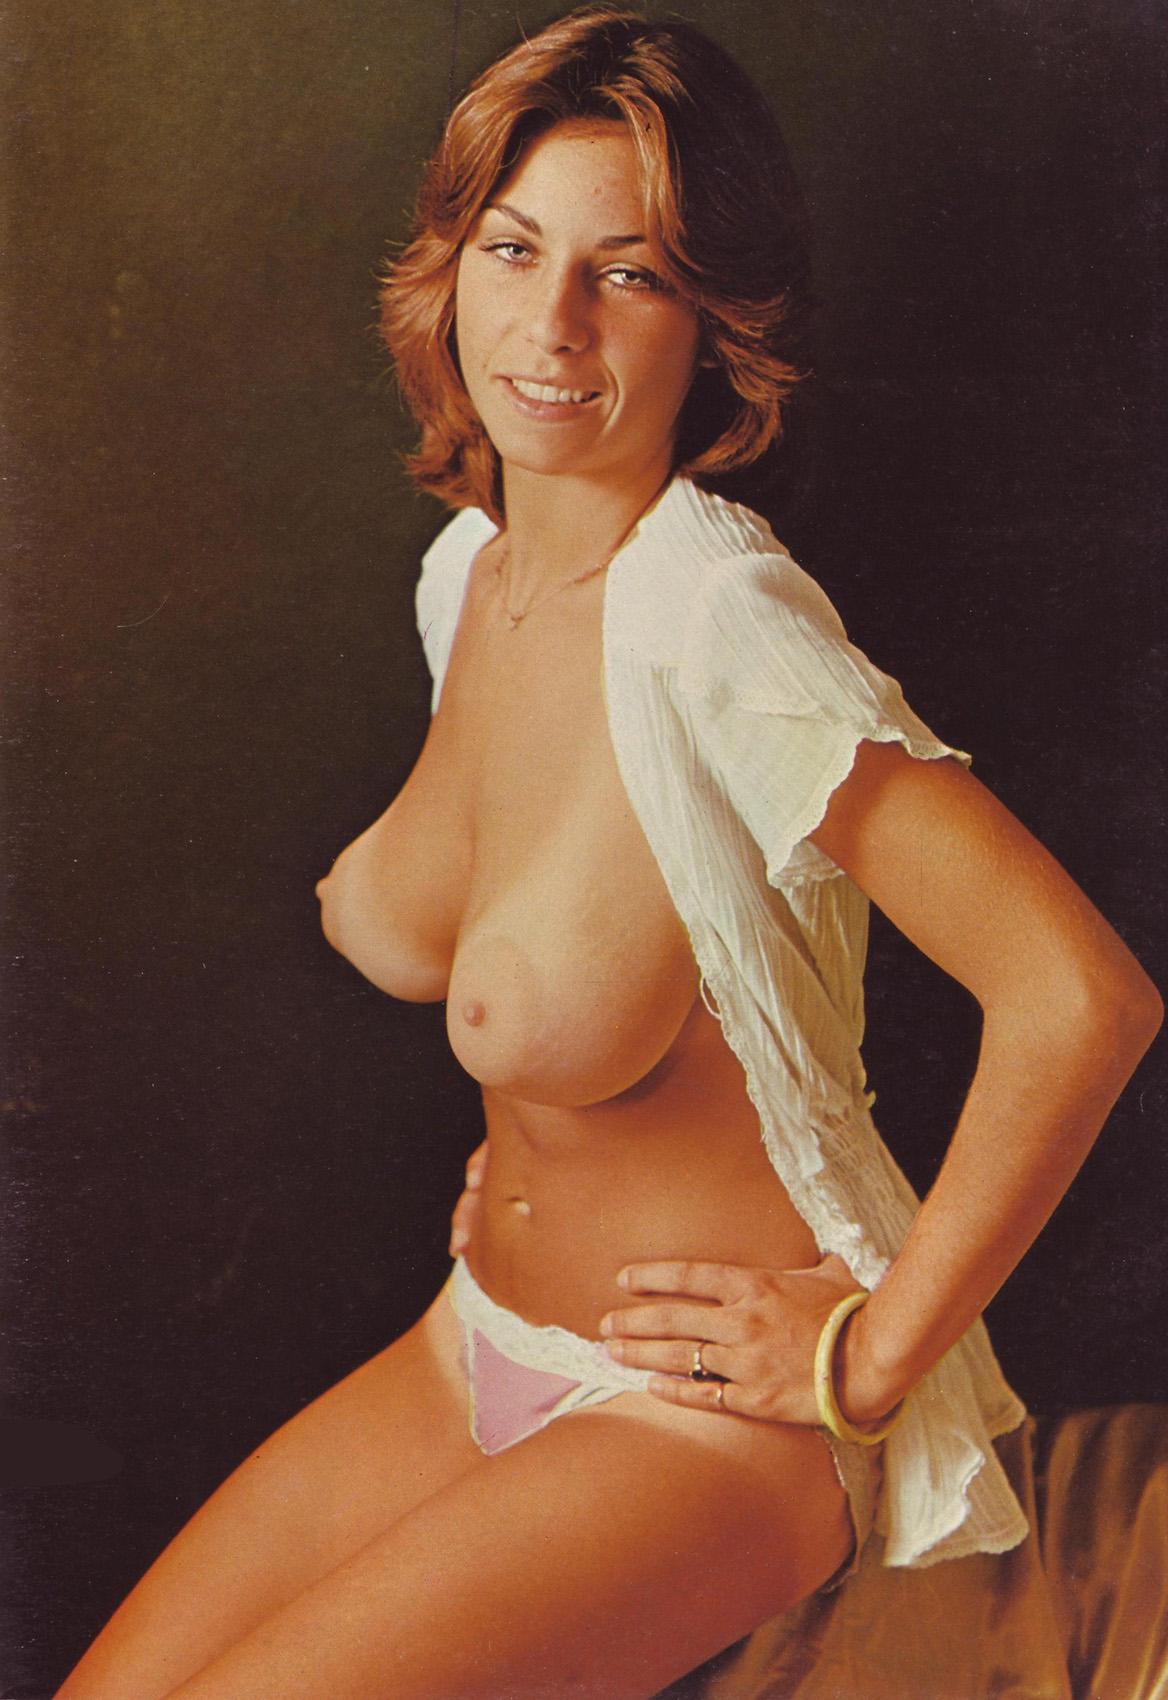 Penny morgan beautiful retro babe nasty sex 8